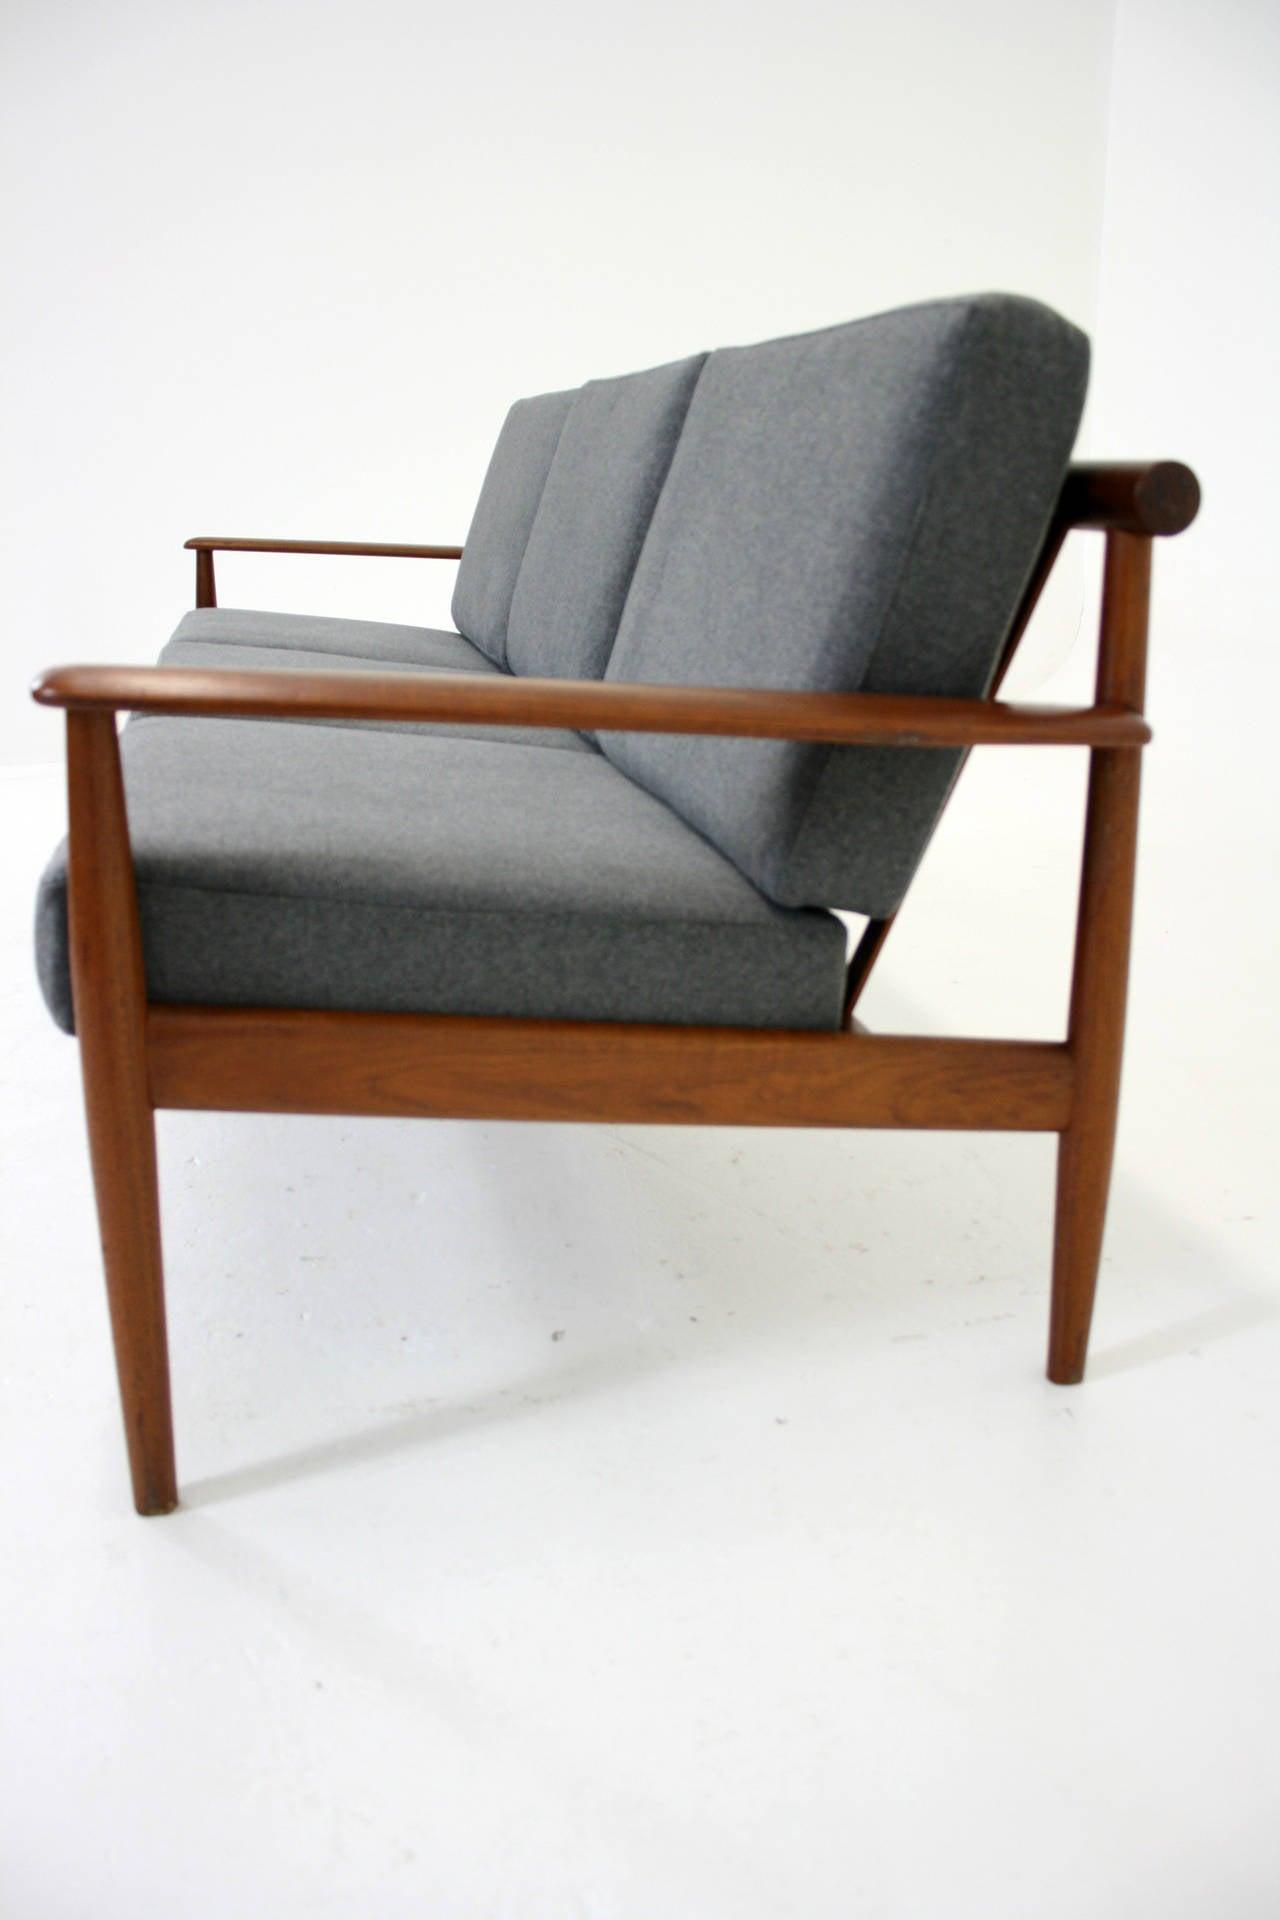 Danish Mid Century Modern Stunning Teak Three Seat Sofa Or Couch At 1stdibs